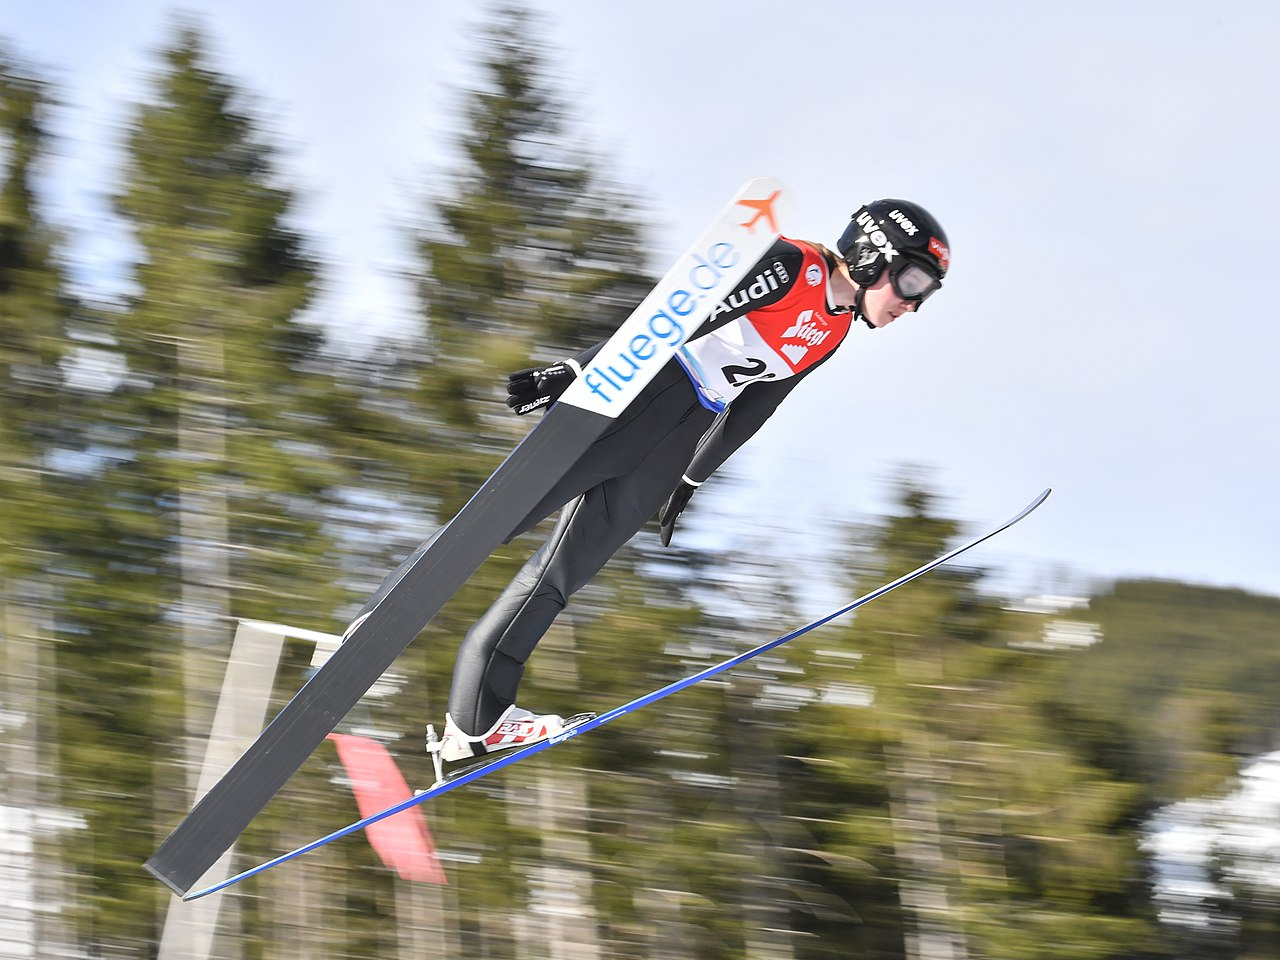 Skispringerin Maria Gerboth